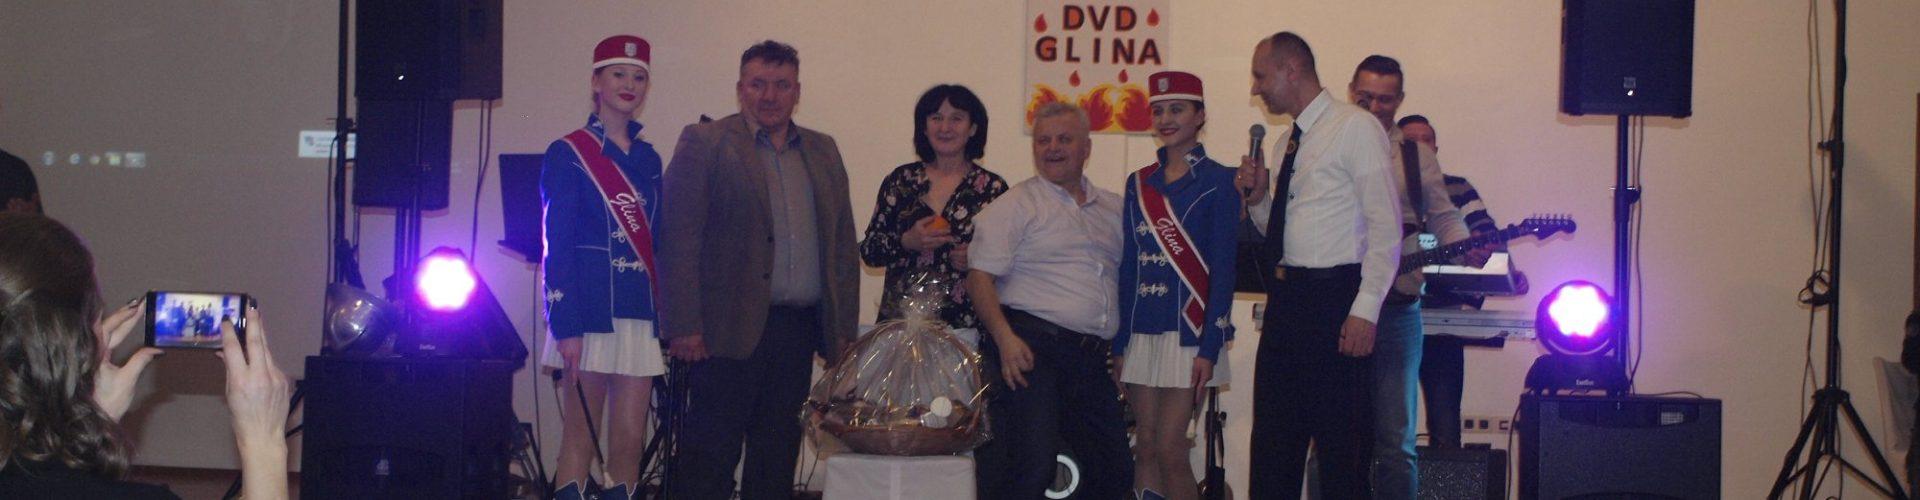 Održan Vatrogasni bal povodom 140. obljetnice osnutka DVD-a Glina